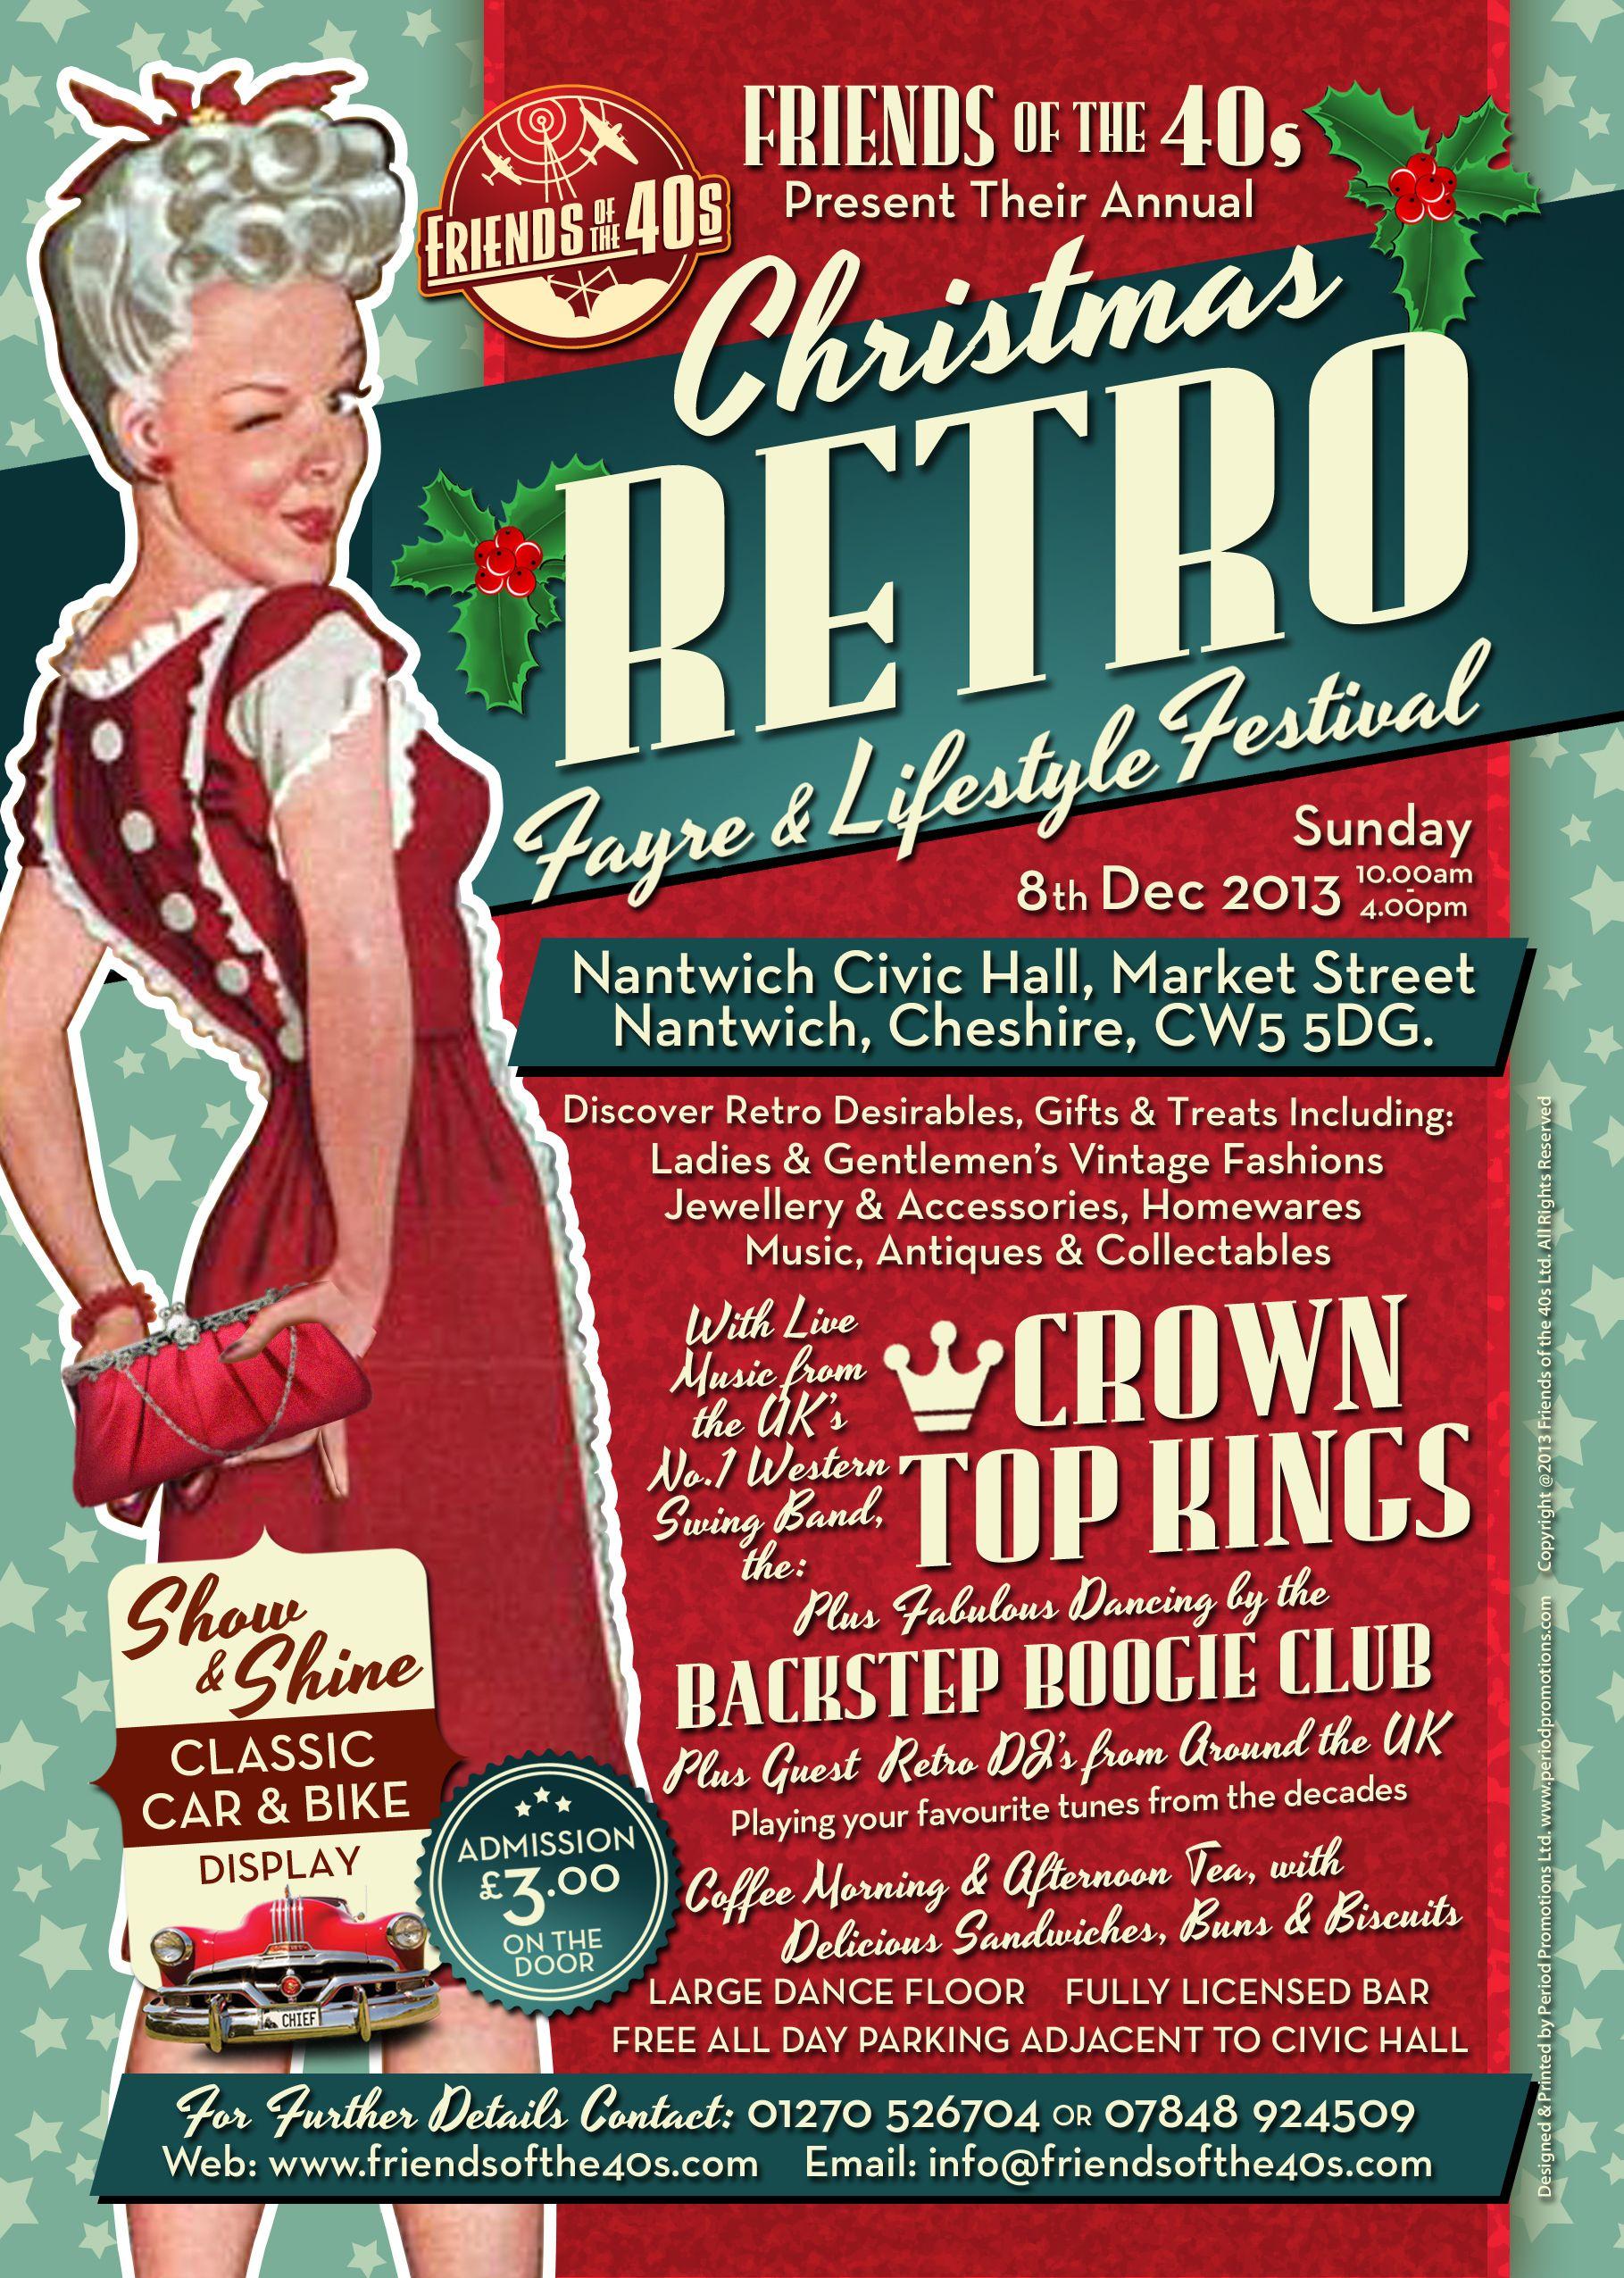 promotional poster for fotf annual christmas retro  u0026 vintage lifestyle fair  nantwich historic